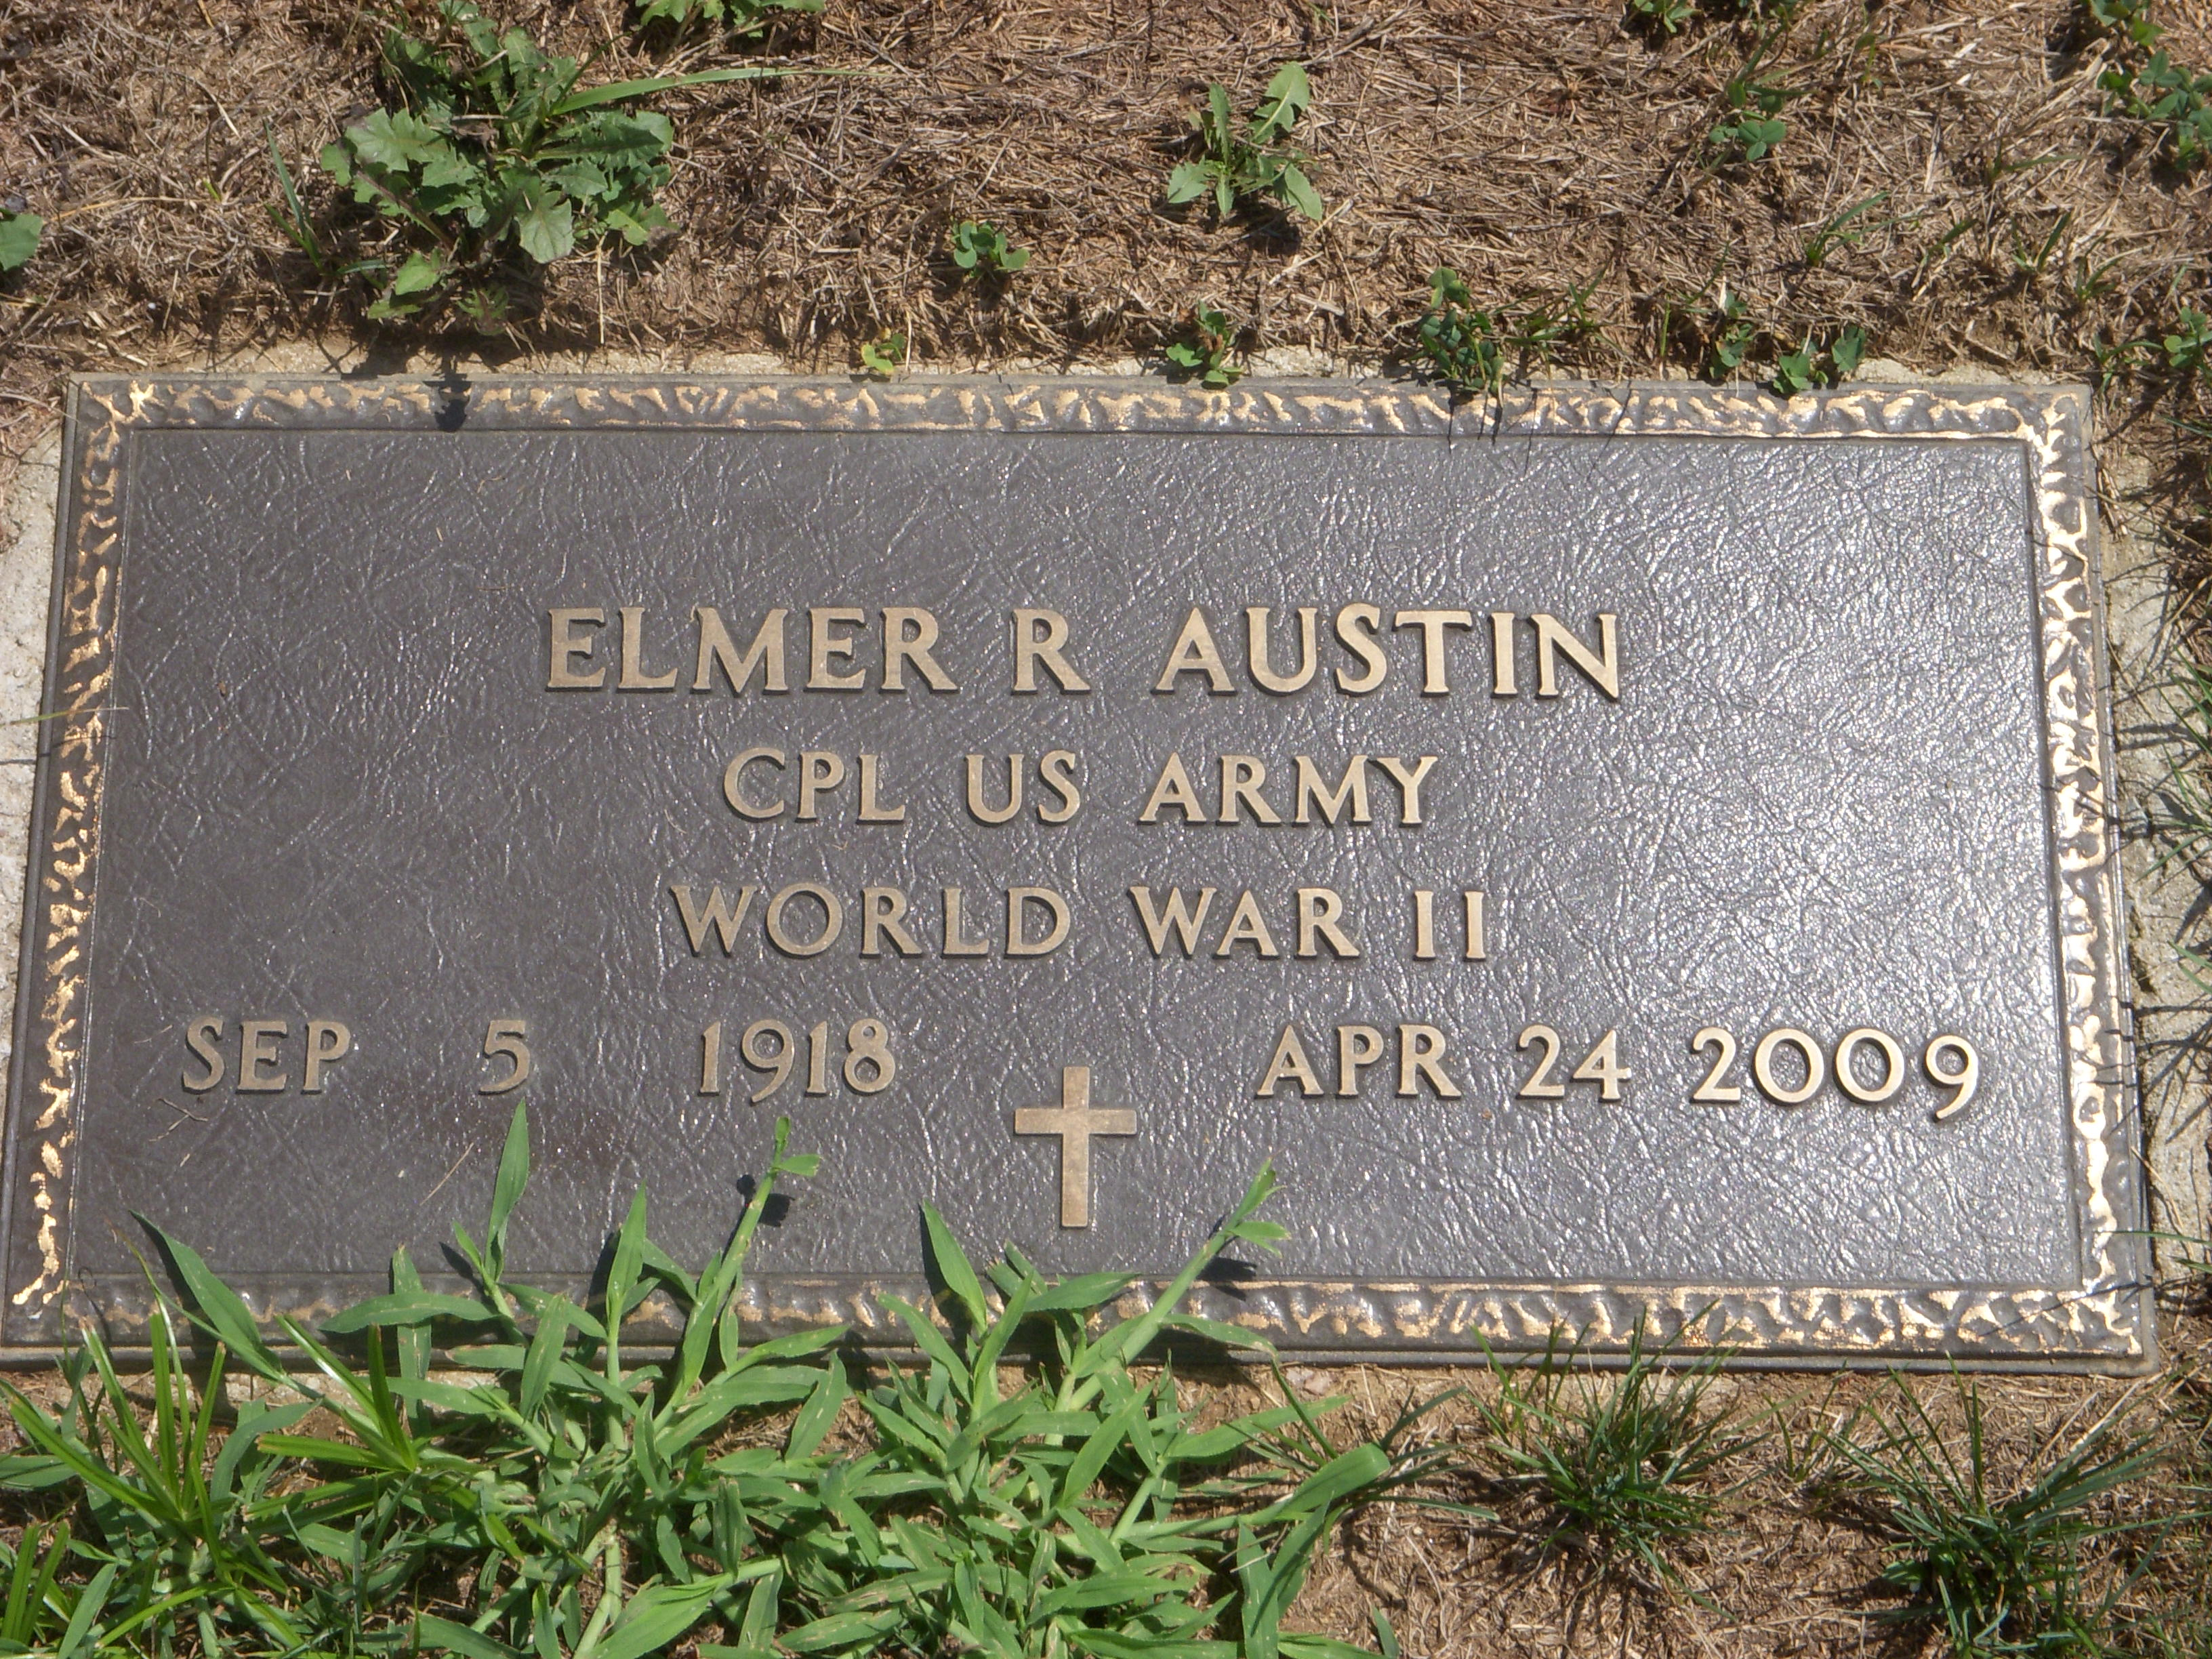 Elmer R. Austin